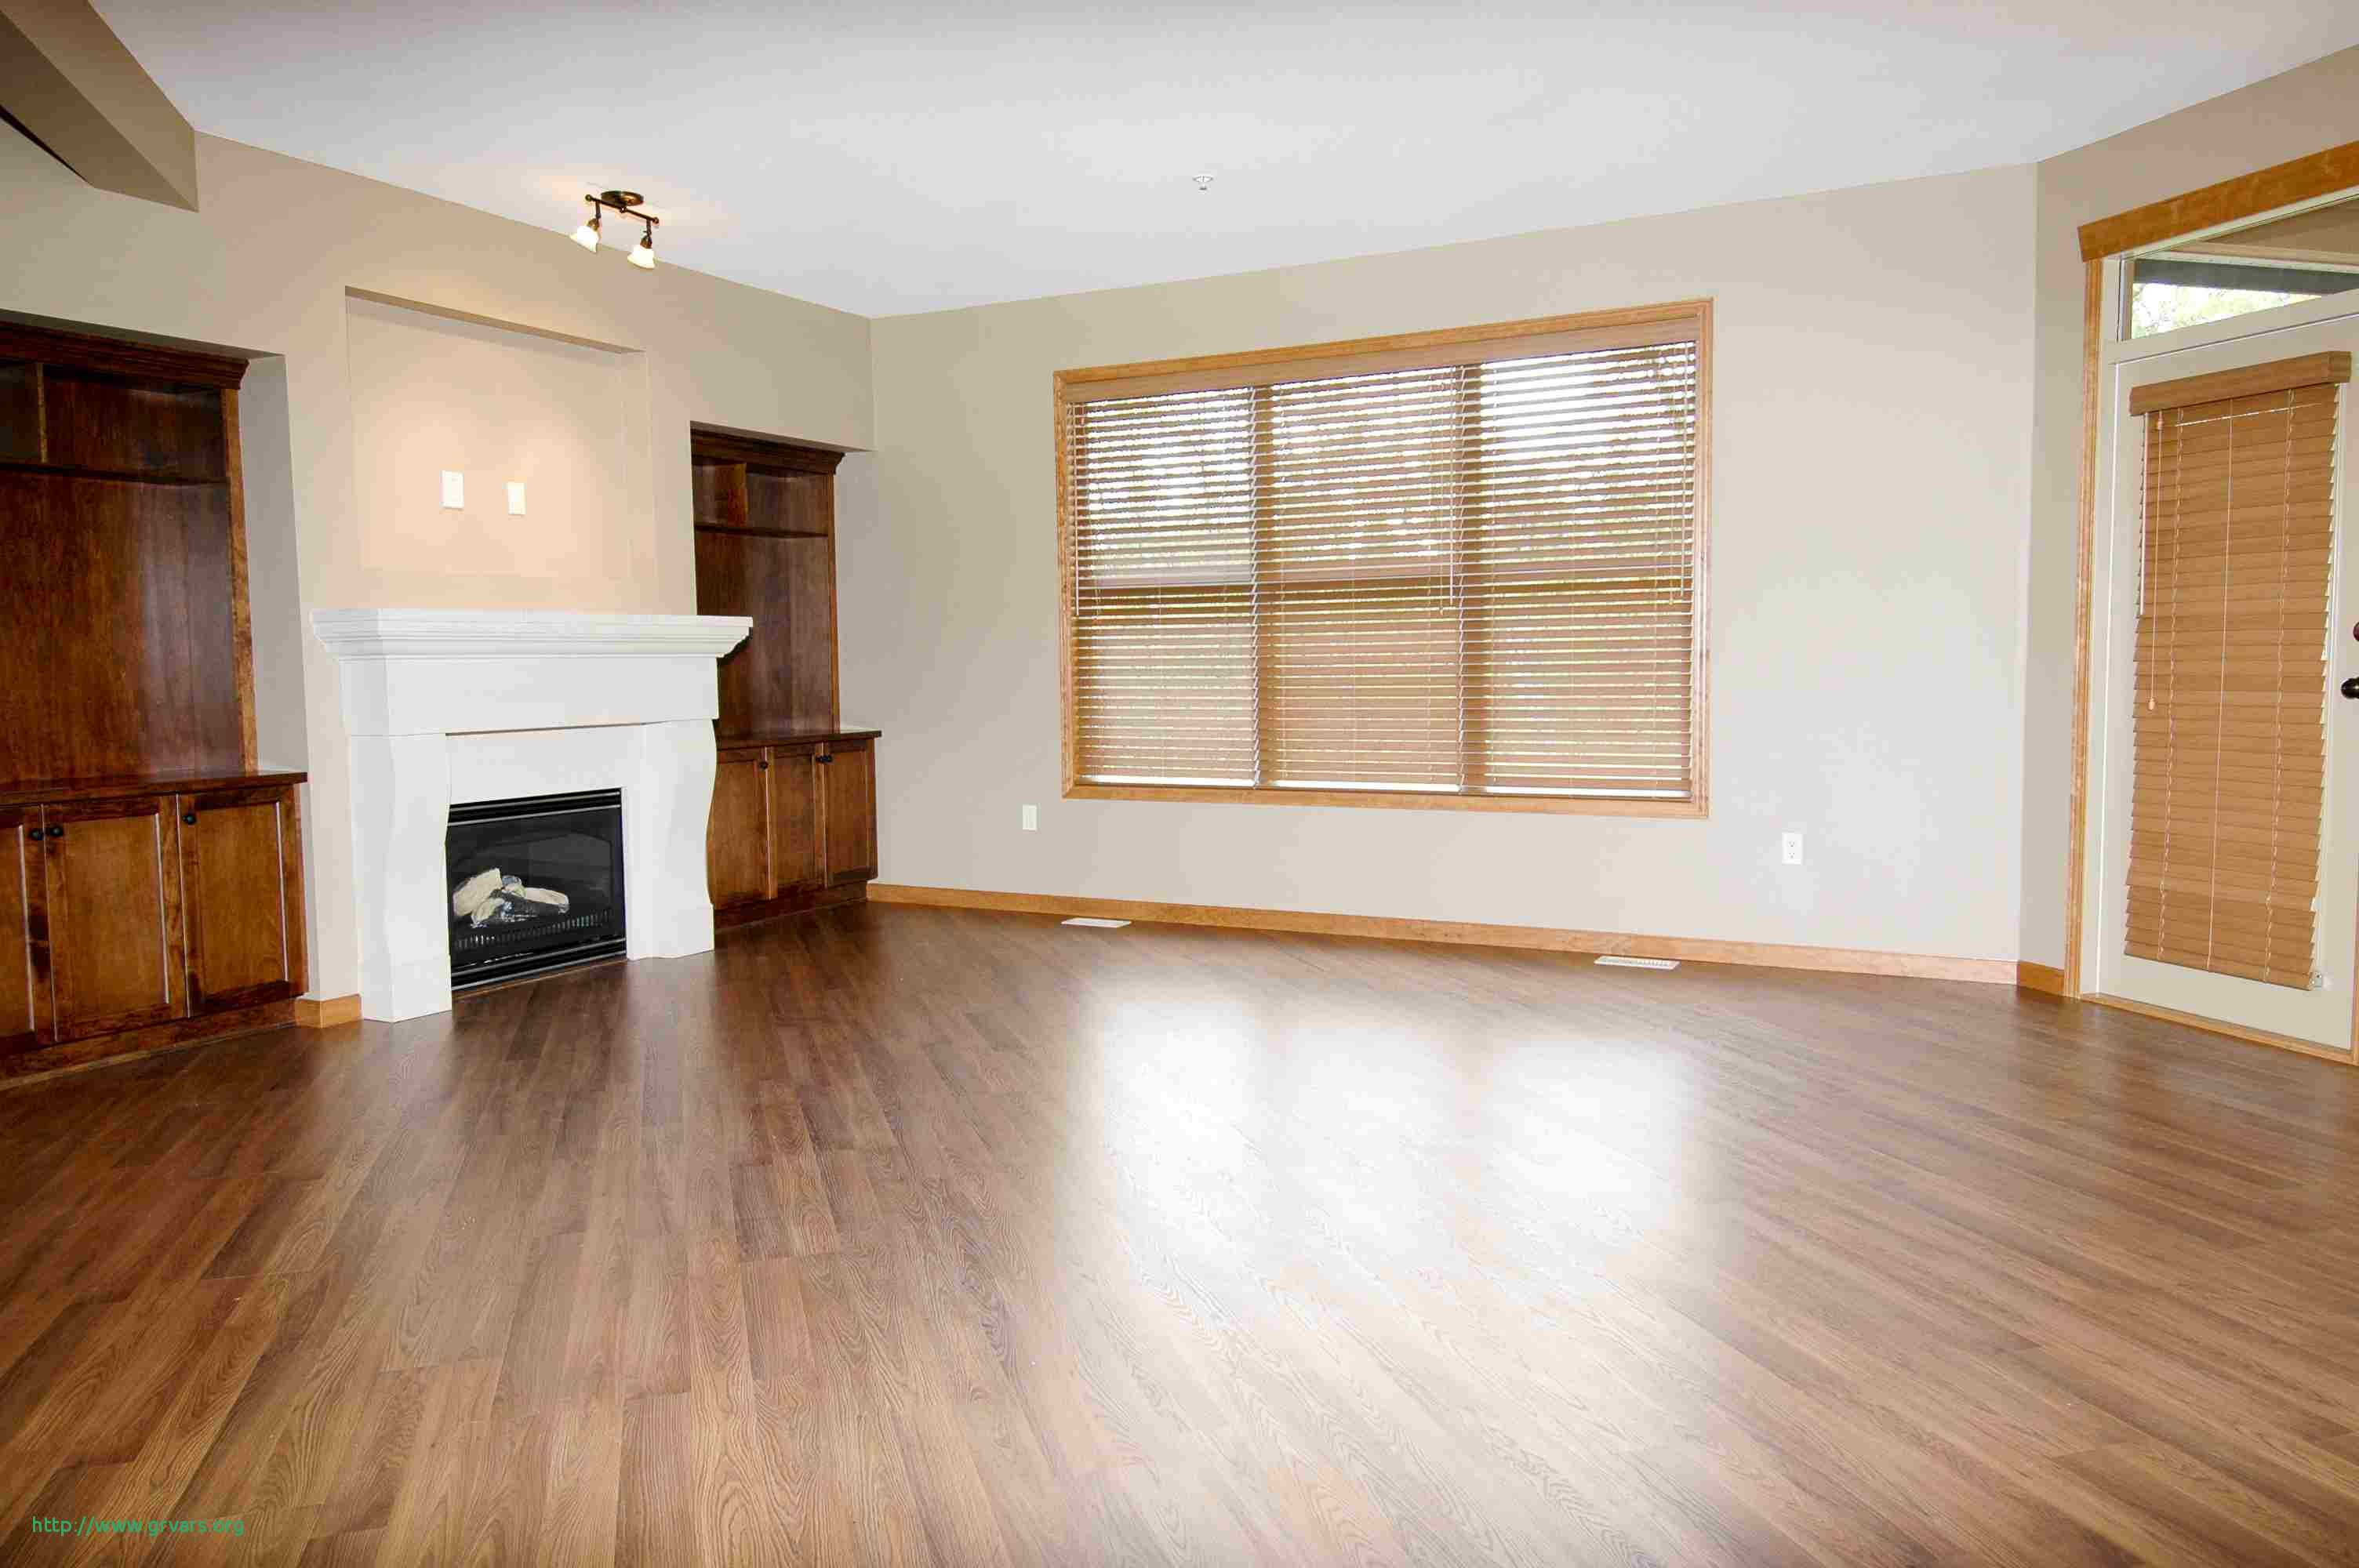 25 Amazing Problems With Hickory Hardwood Flooring Unique